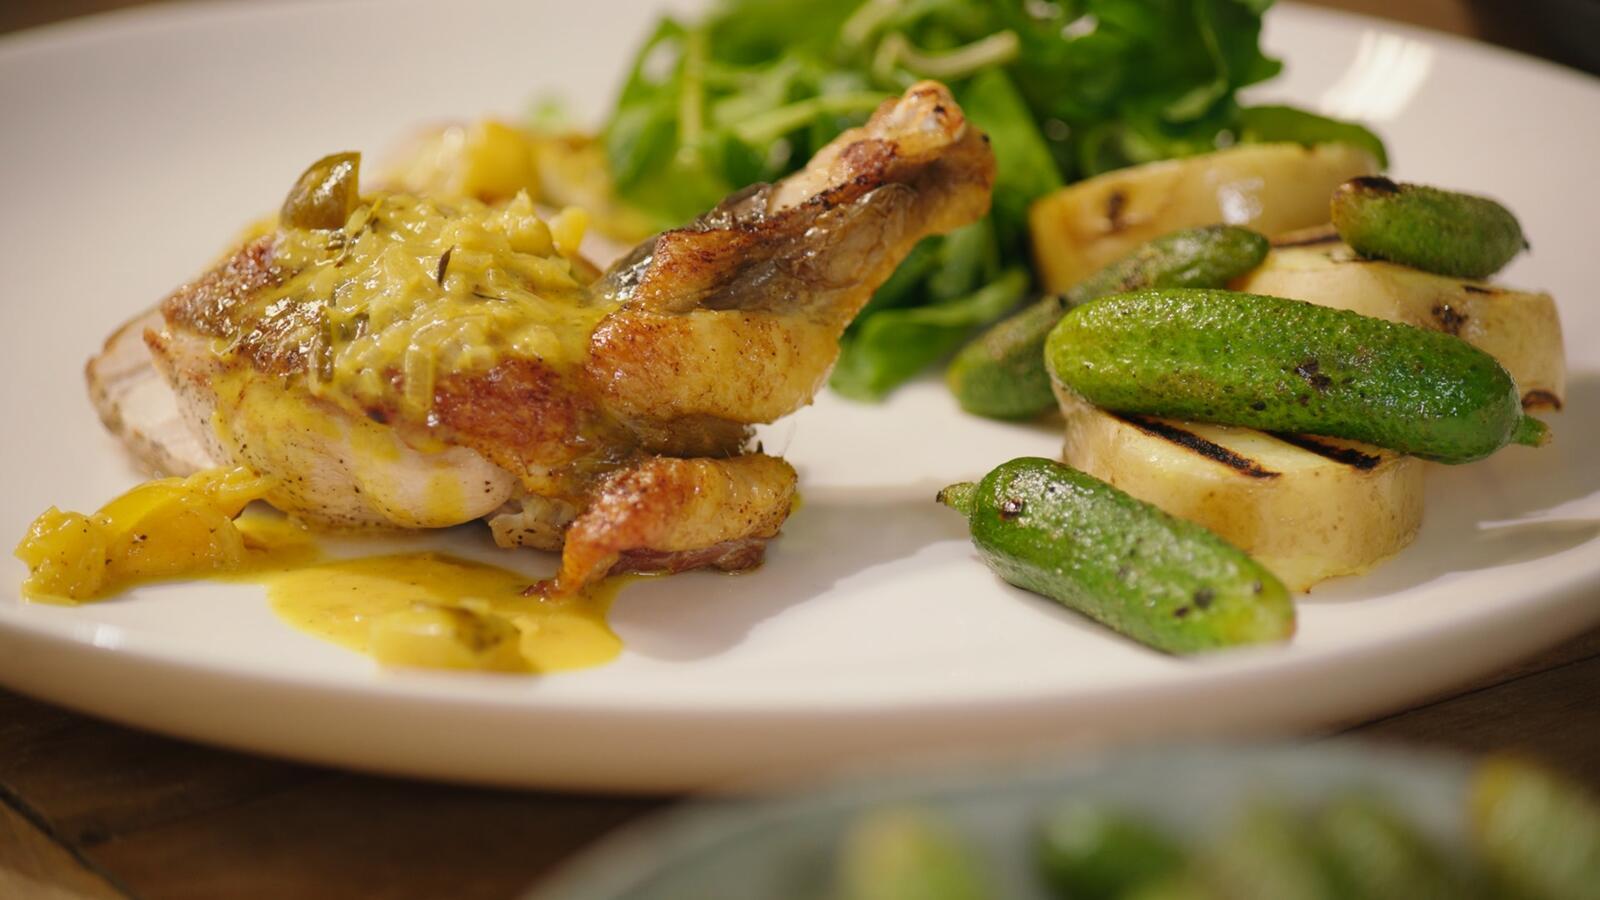 Parelhoen 'crosse & blackwell' met gegrilde aardappel en augurk